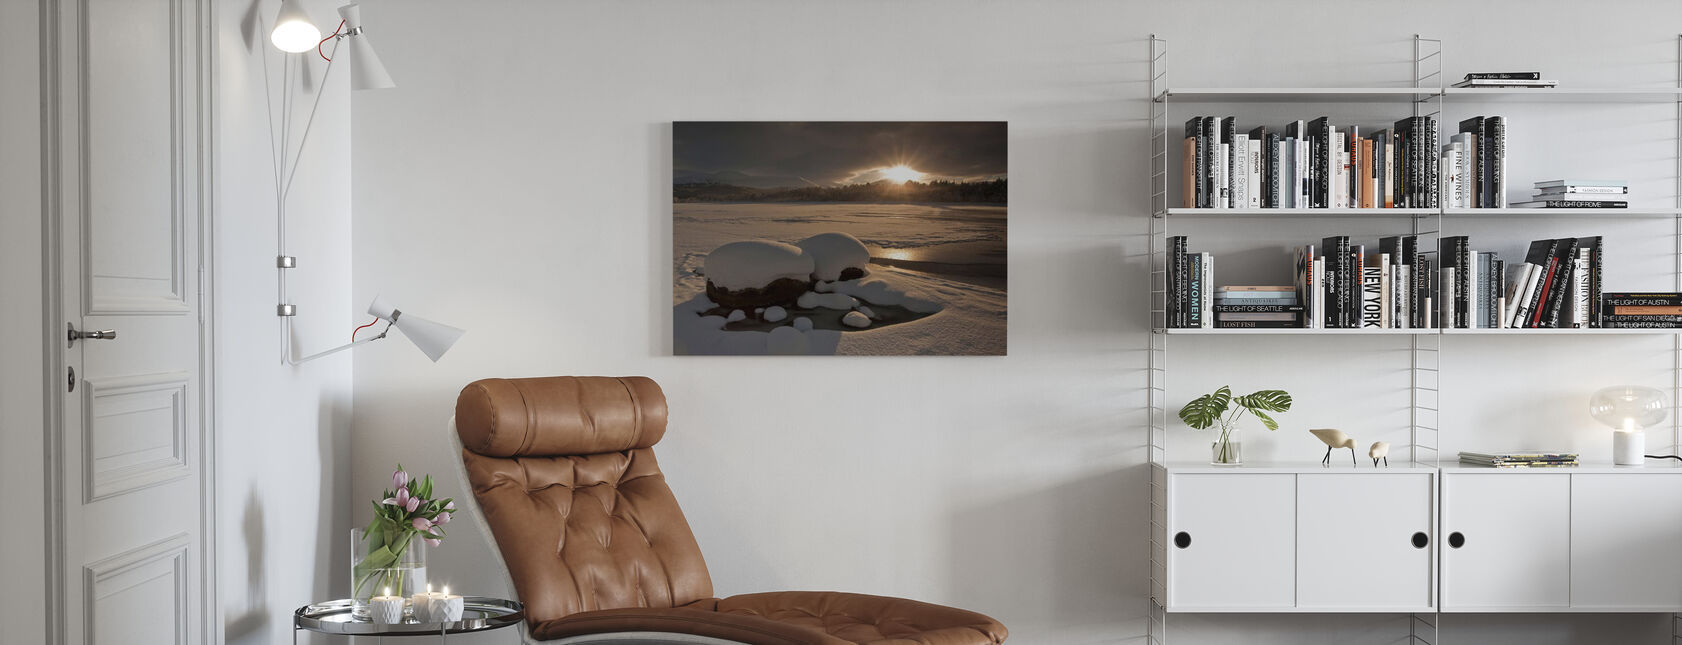 Loch Morlich Frozen Over - Canvas print - Living Room